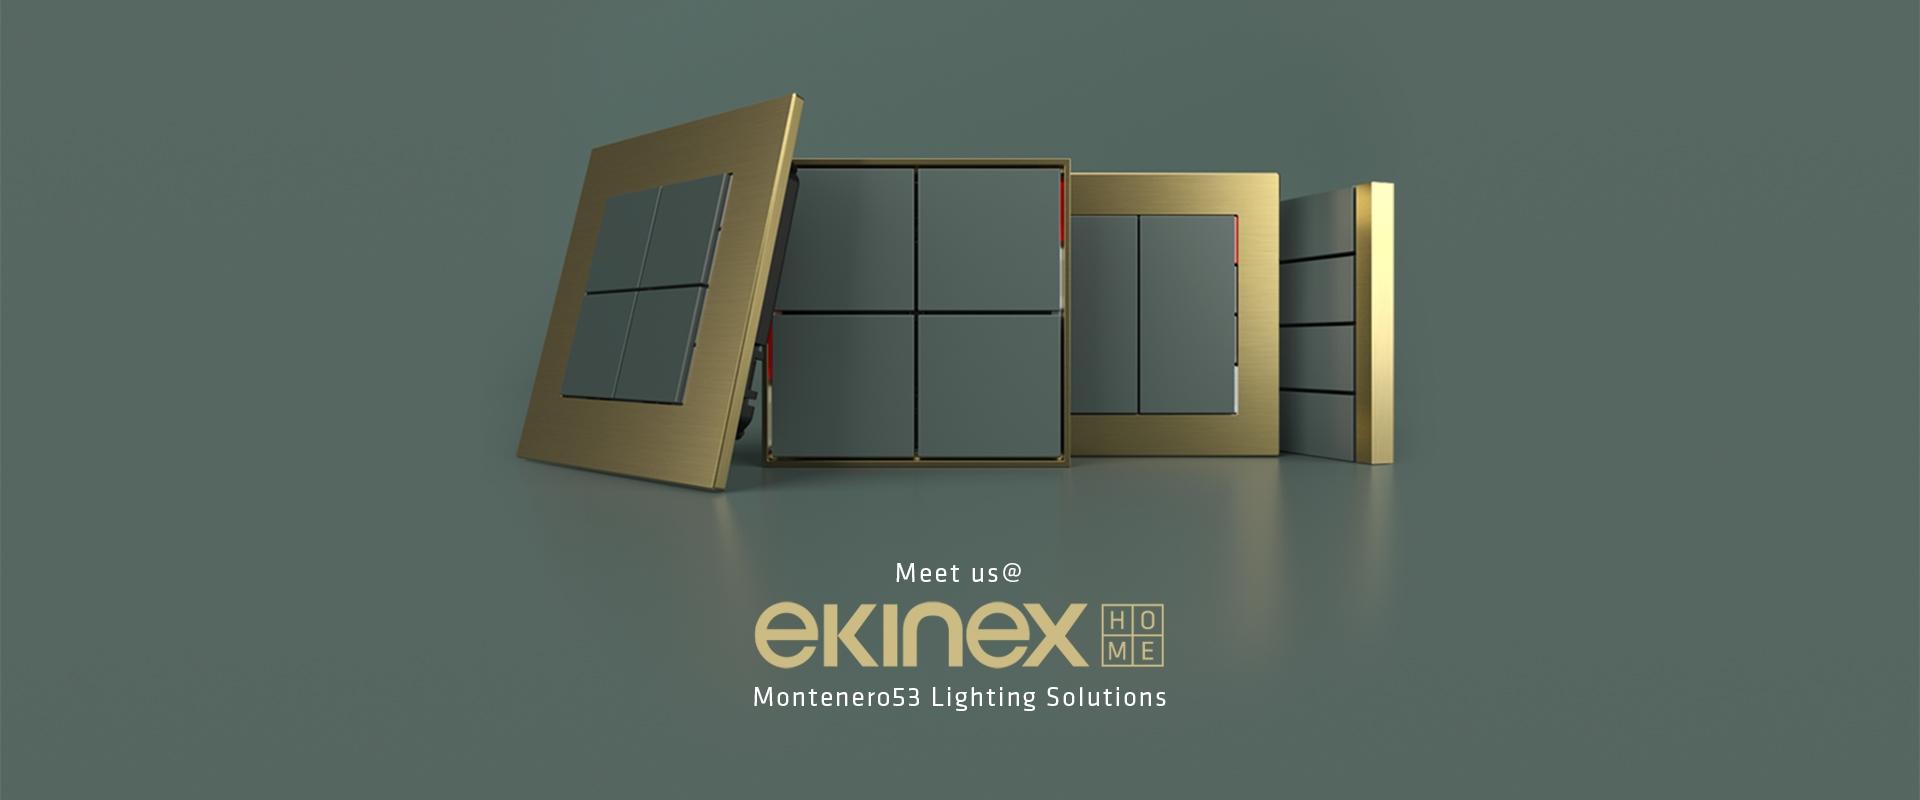 TECNOLOGIA, ESTETICA E DESIGN: nuovo Ekinex corner MONTENERO53 Showroom Milano